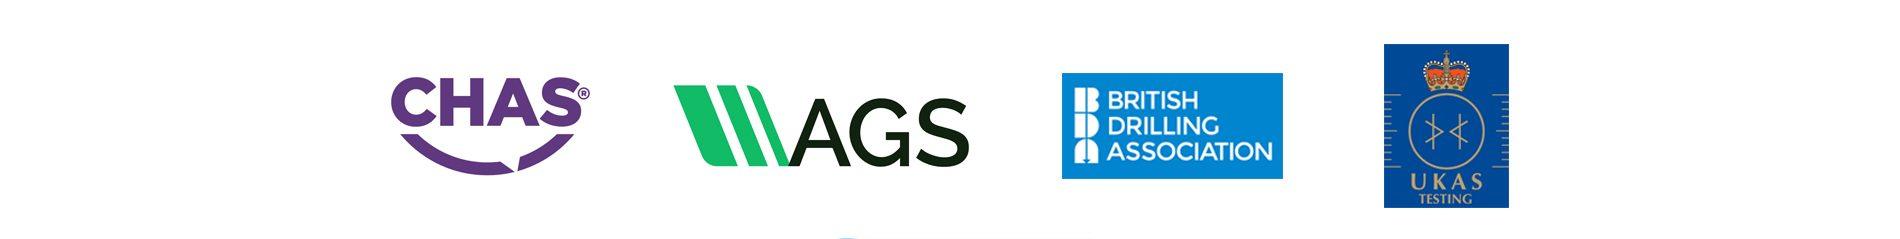 Accreditation logos 2